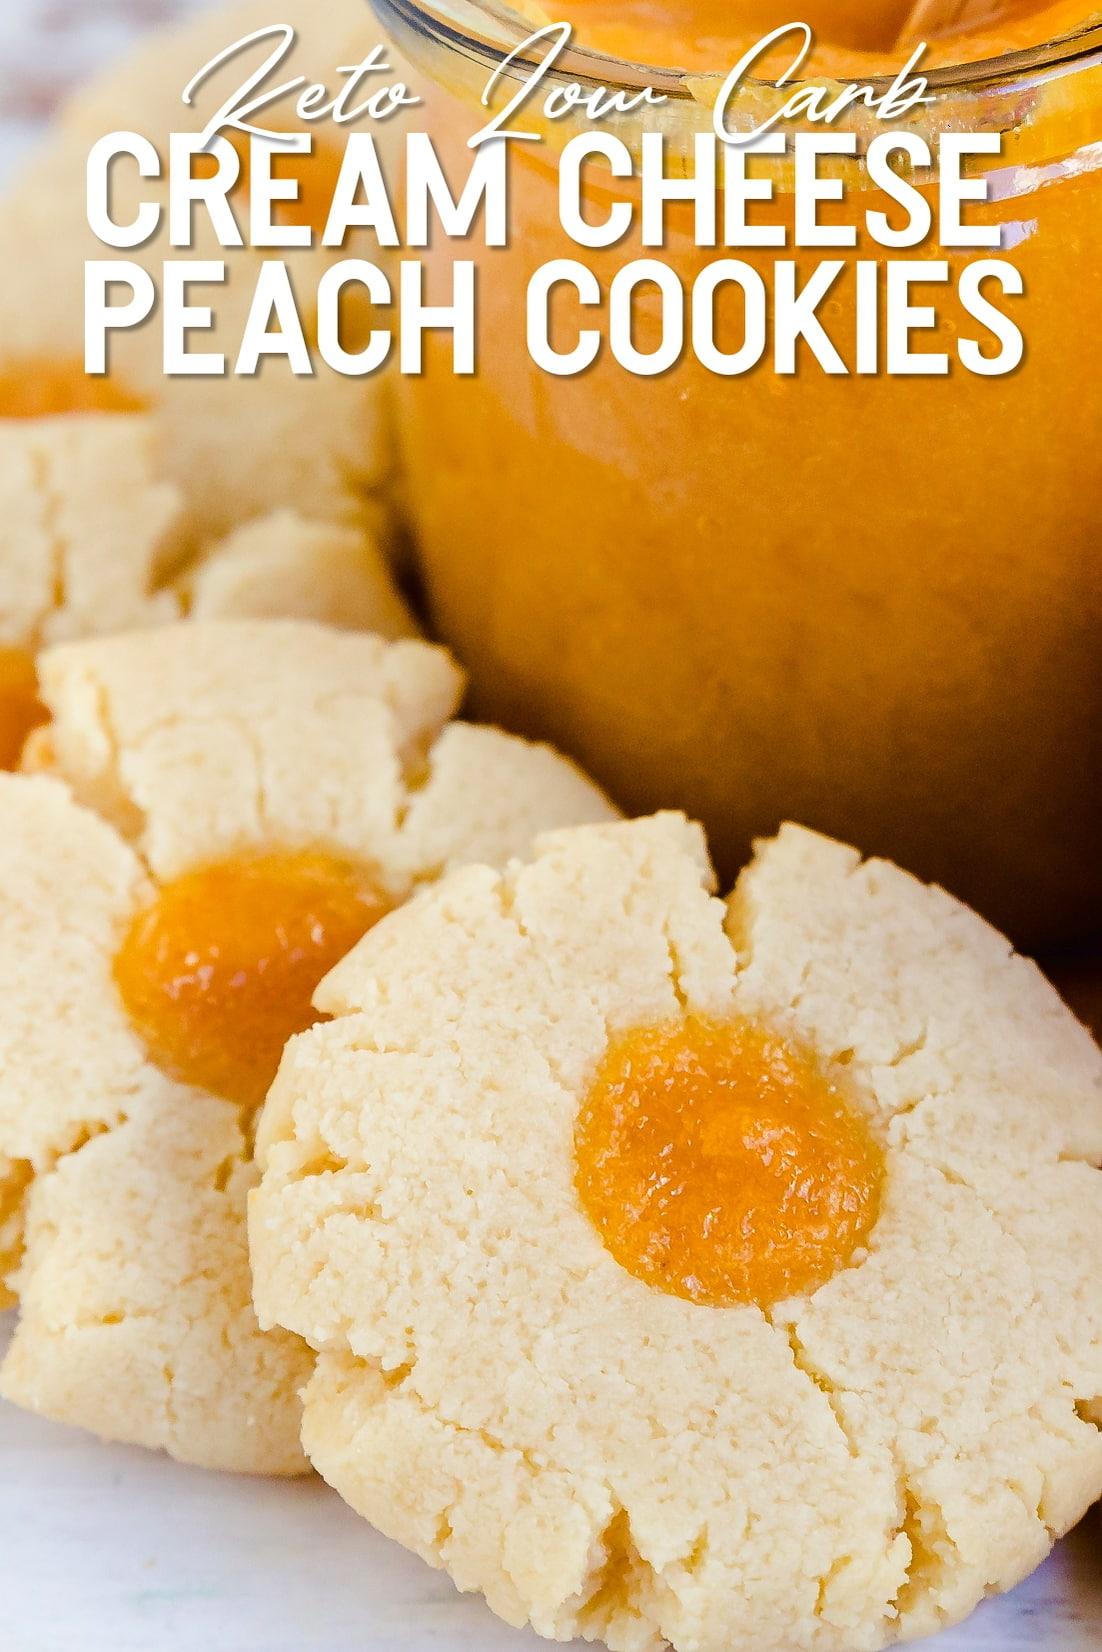 Keto Cream Cheese Peach Cookies Laying down next to jar of peach sauce